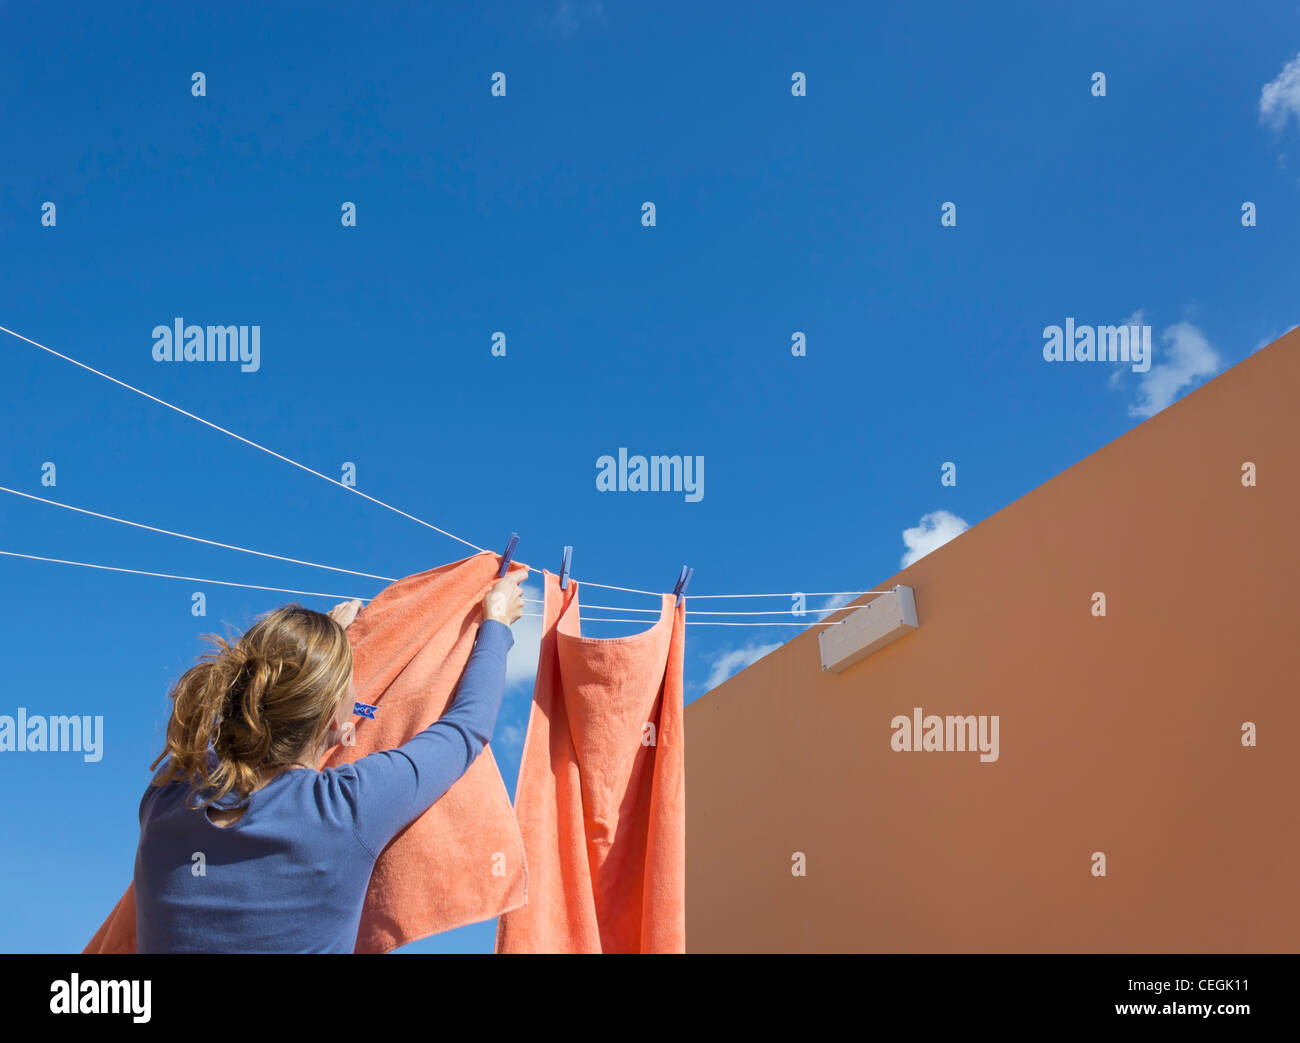 Dry Pegging